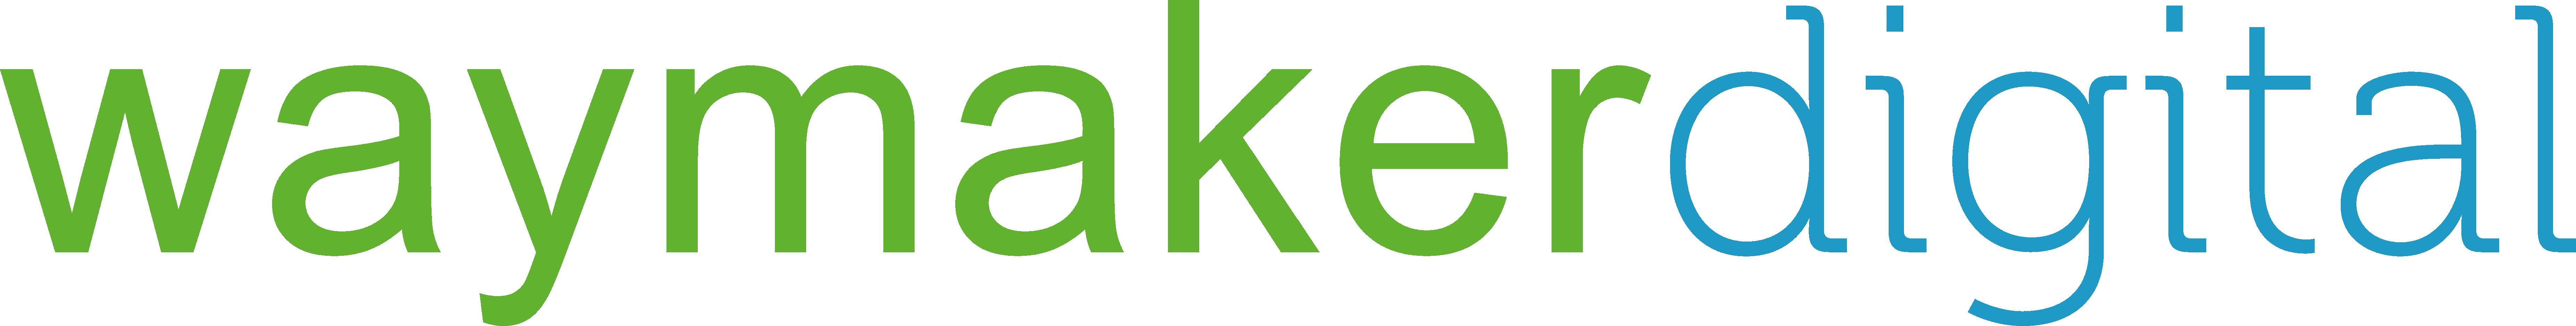 WayMaker Digital Logo